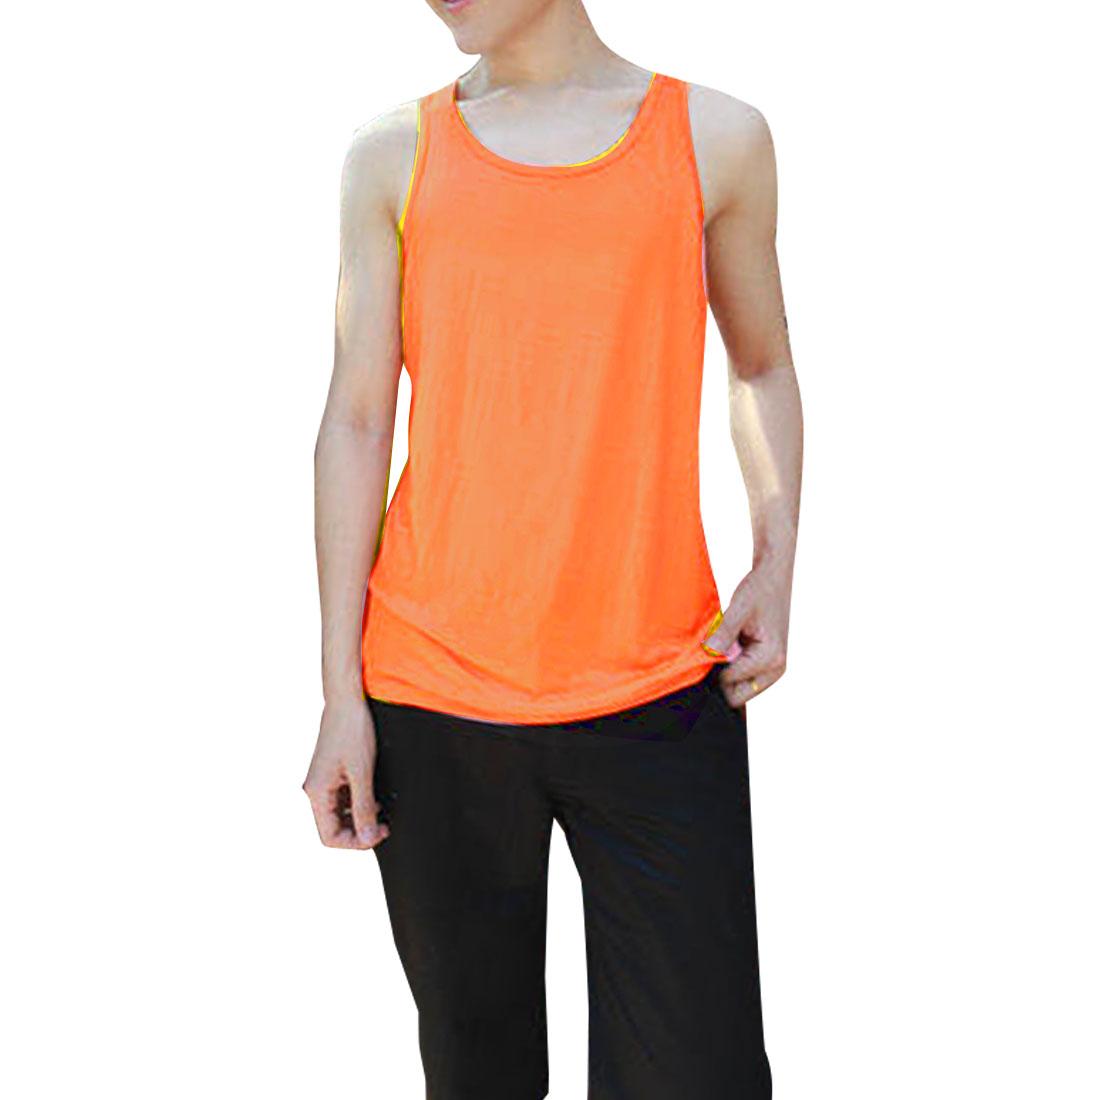 Men NEW Stylish Round Neck Sleeveless Chic Tank Tops Orange M